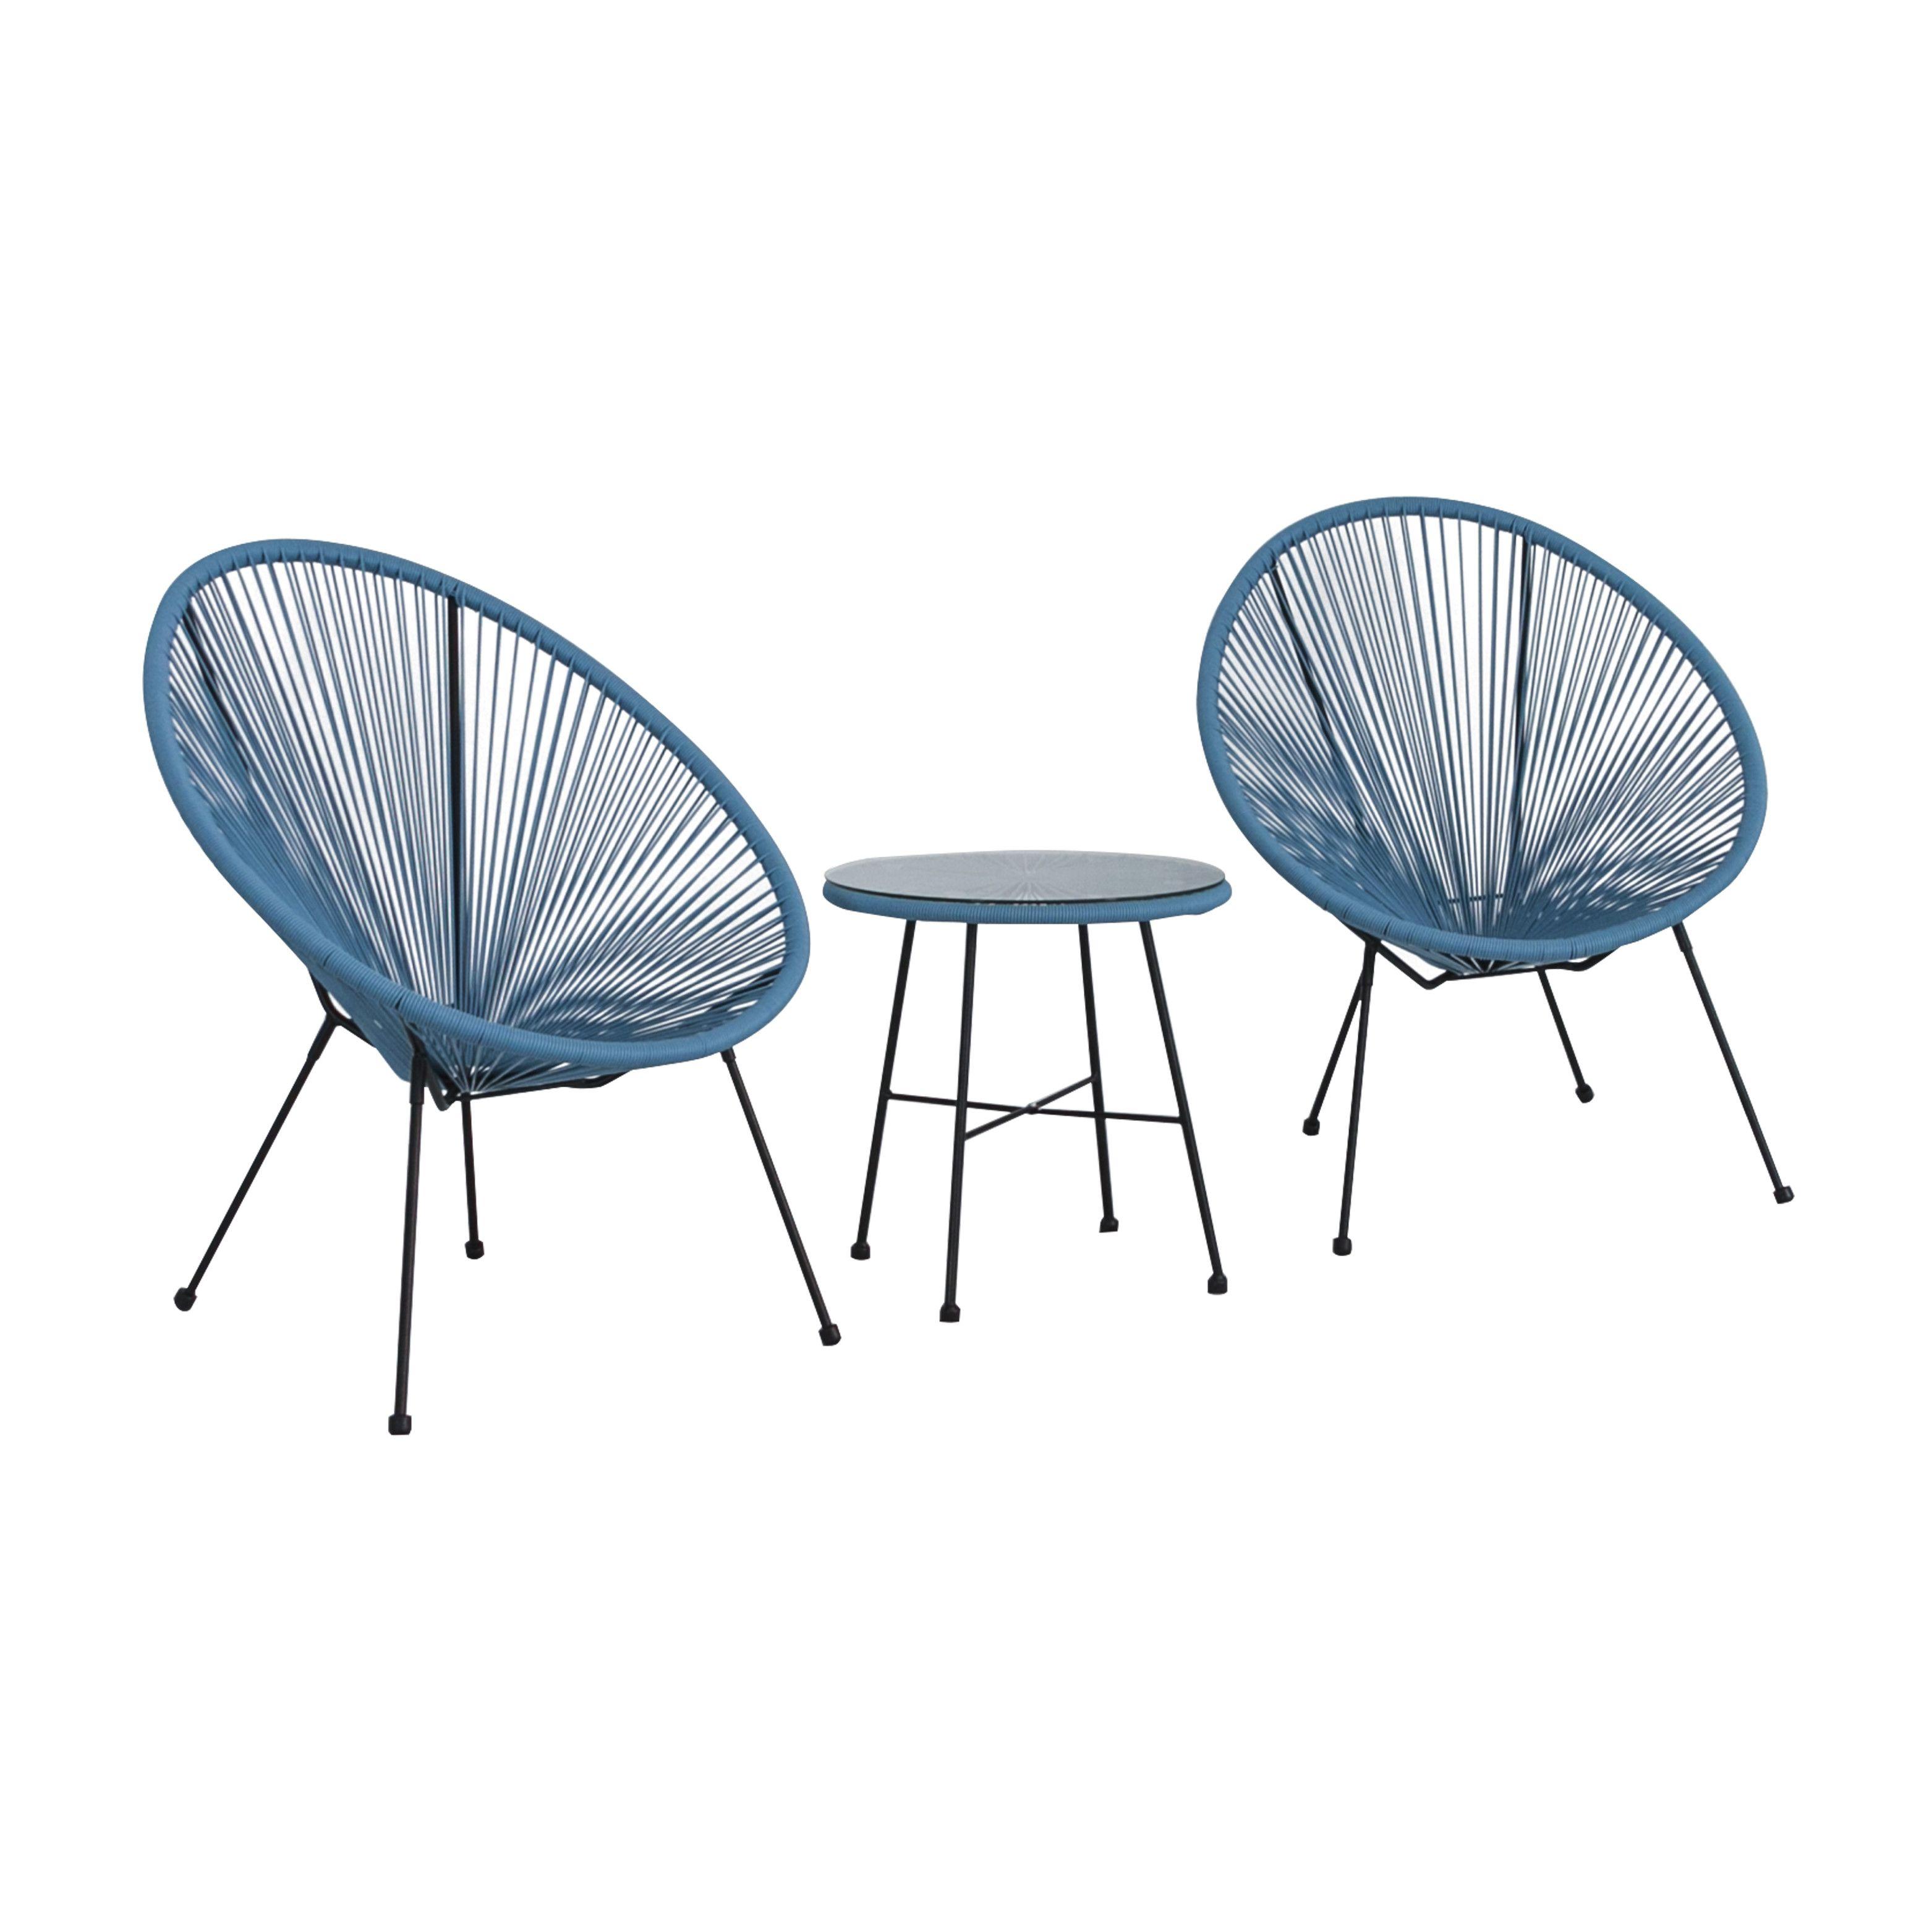 Cansler 2 Seater Rattan Conversation Set Chair, Chair